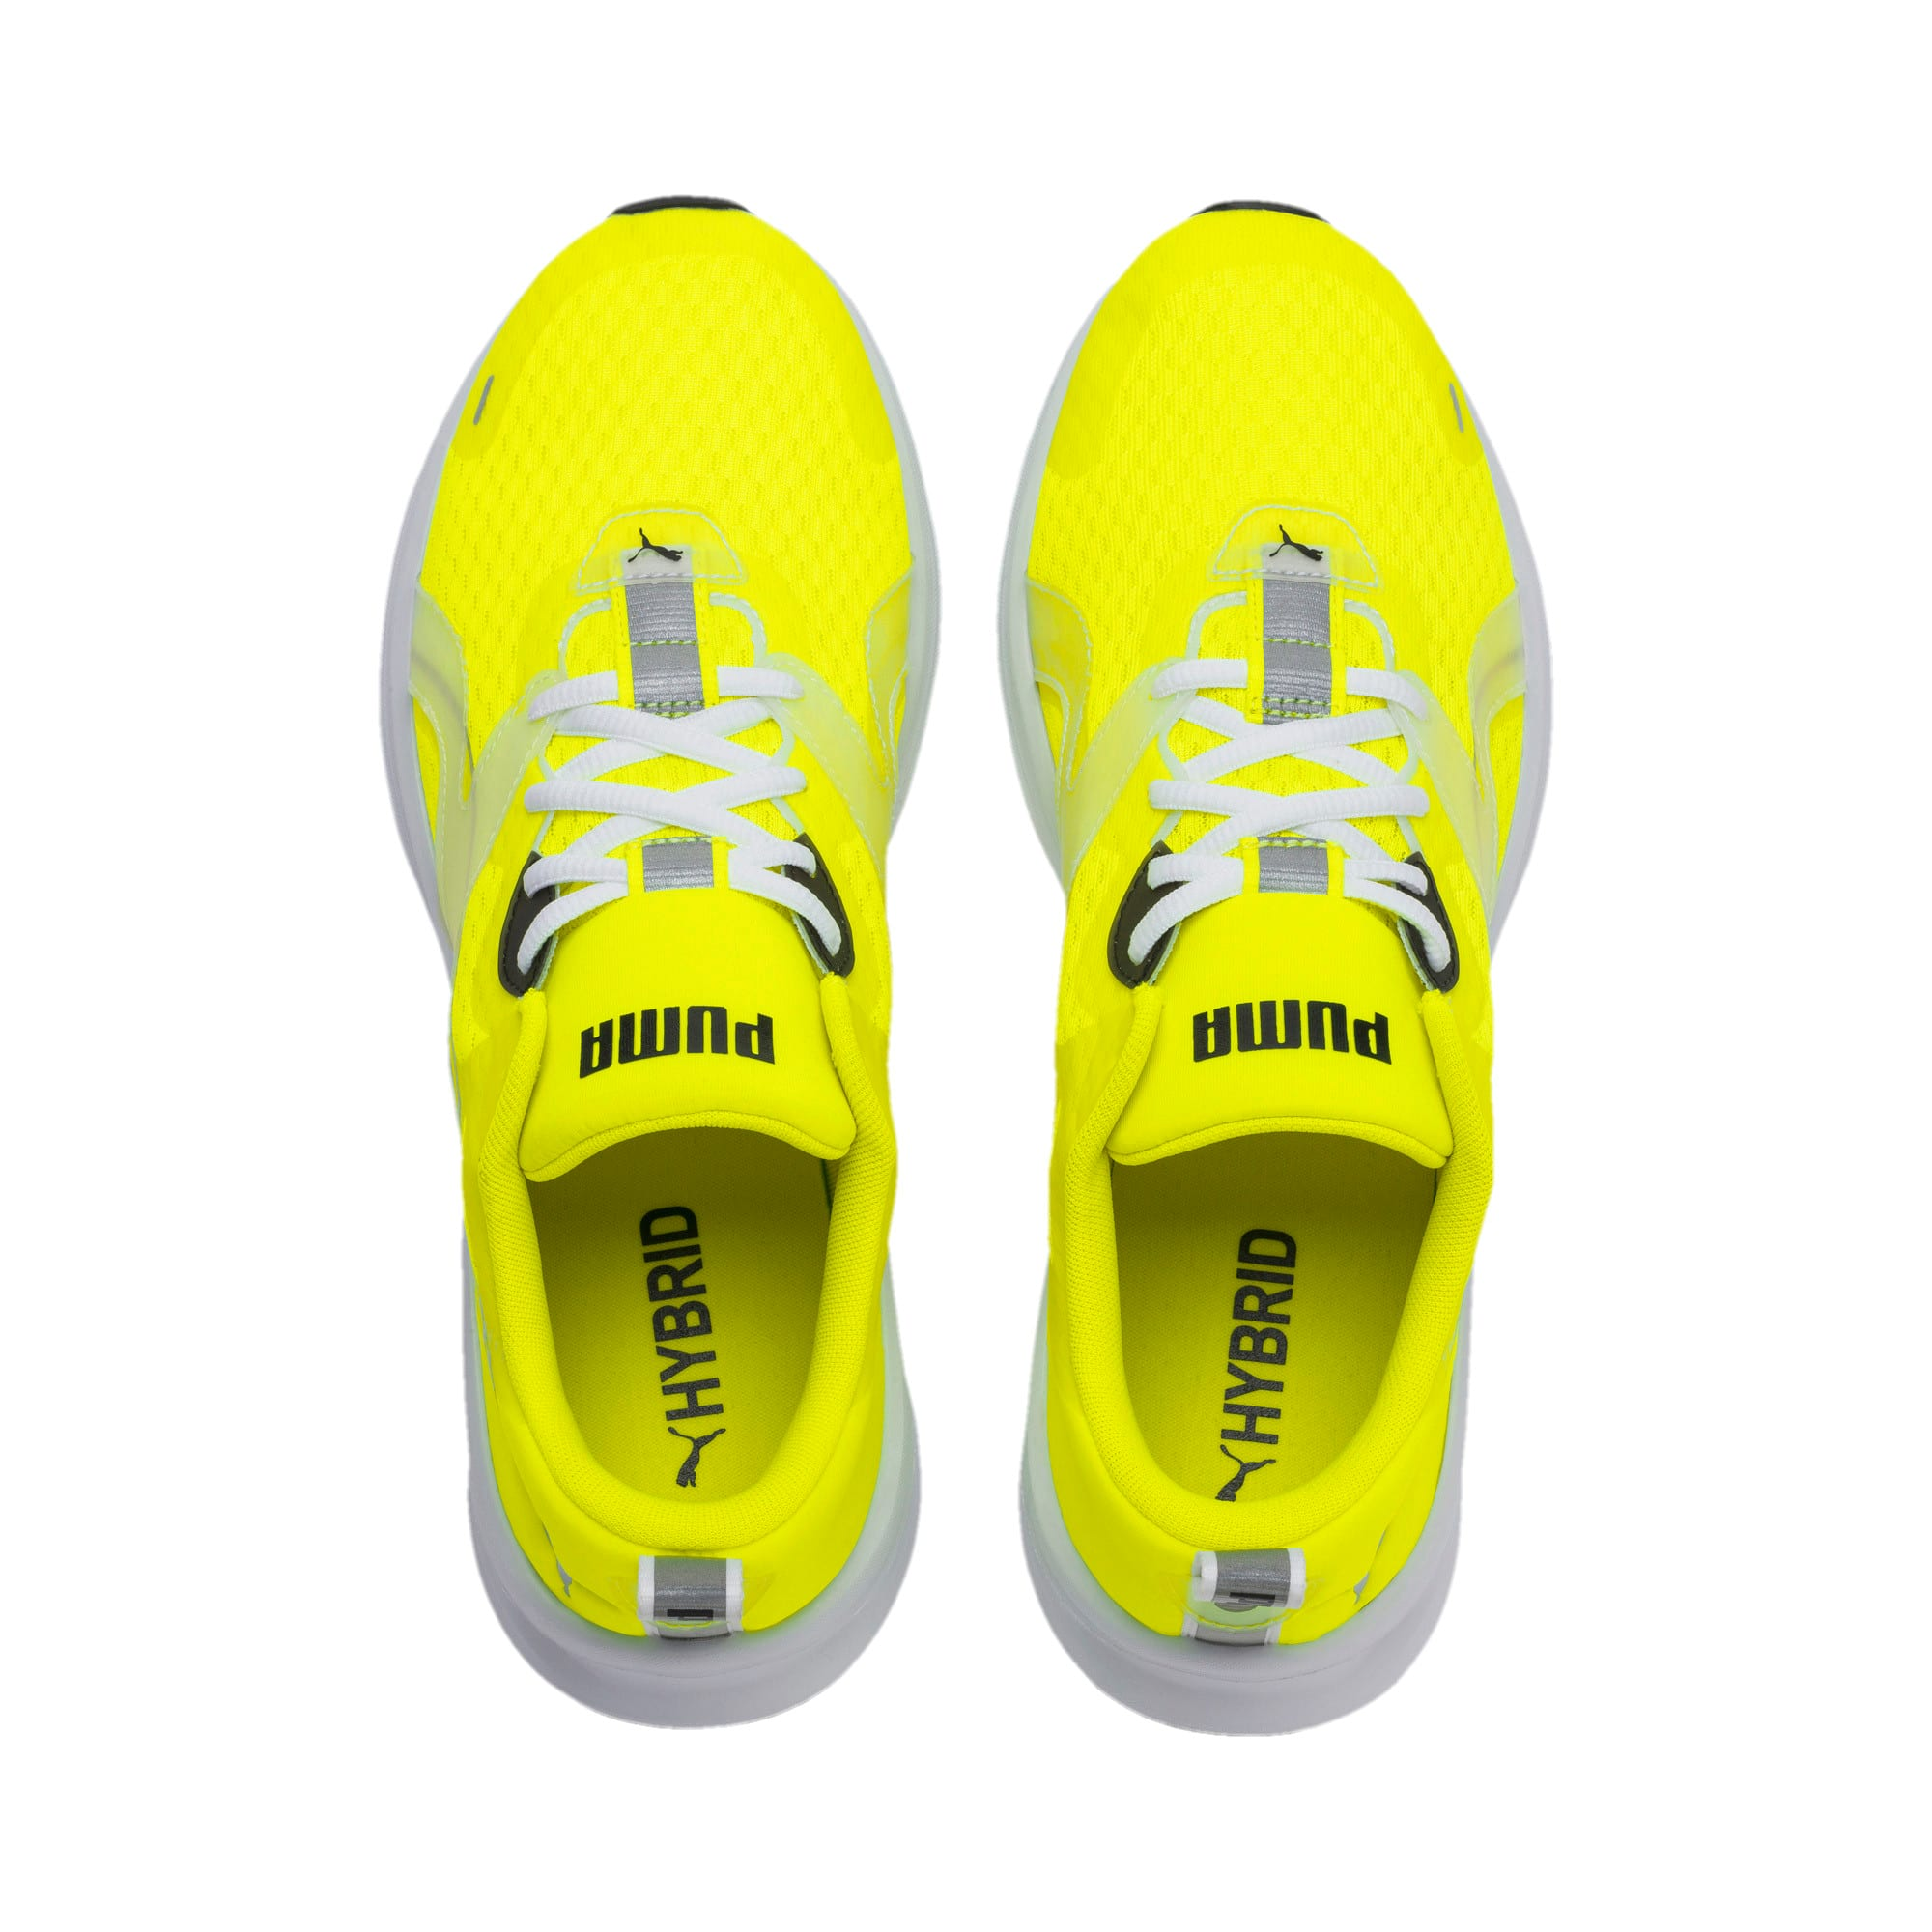 Thumbnail 7 of HYBRID Fuego Lights Men's Running Shoes, Yellow Alert, medium